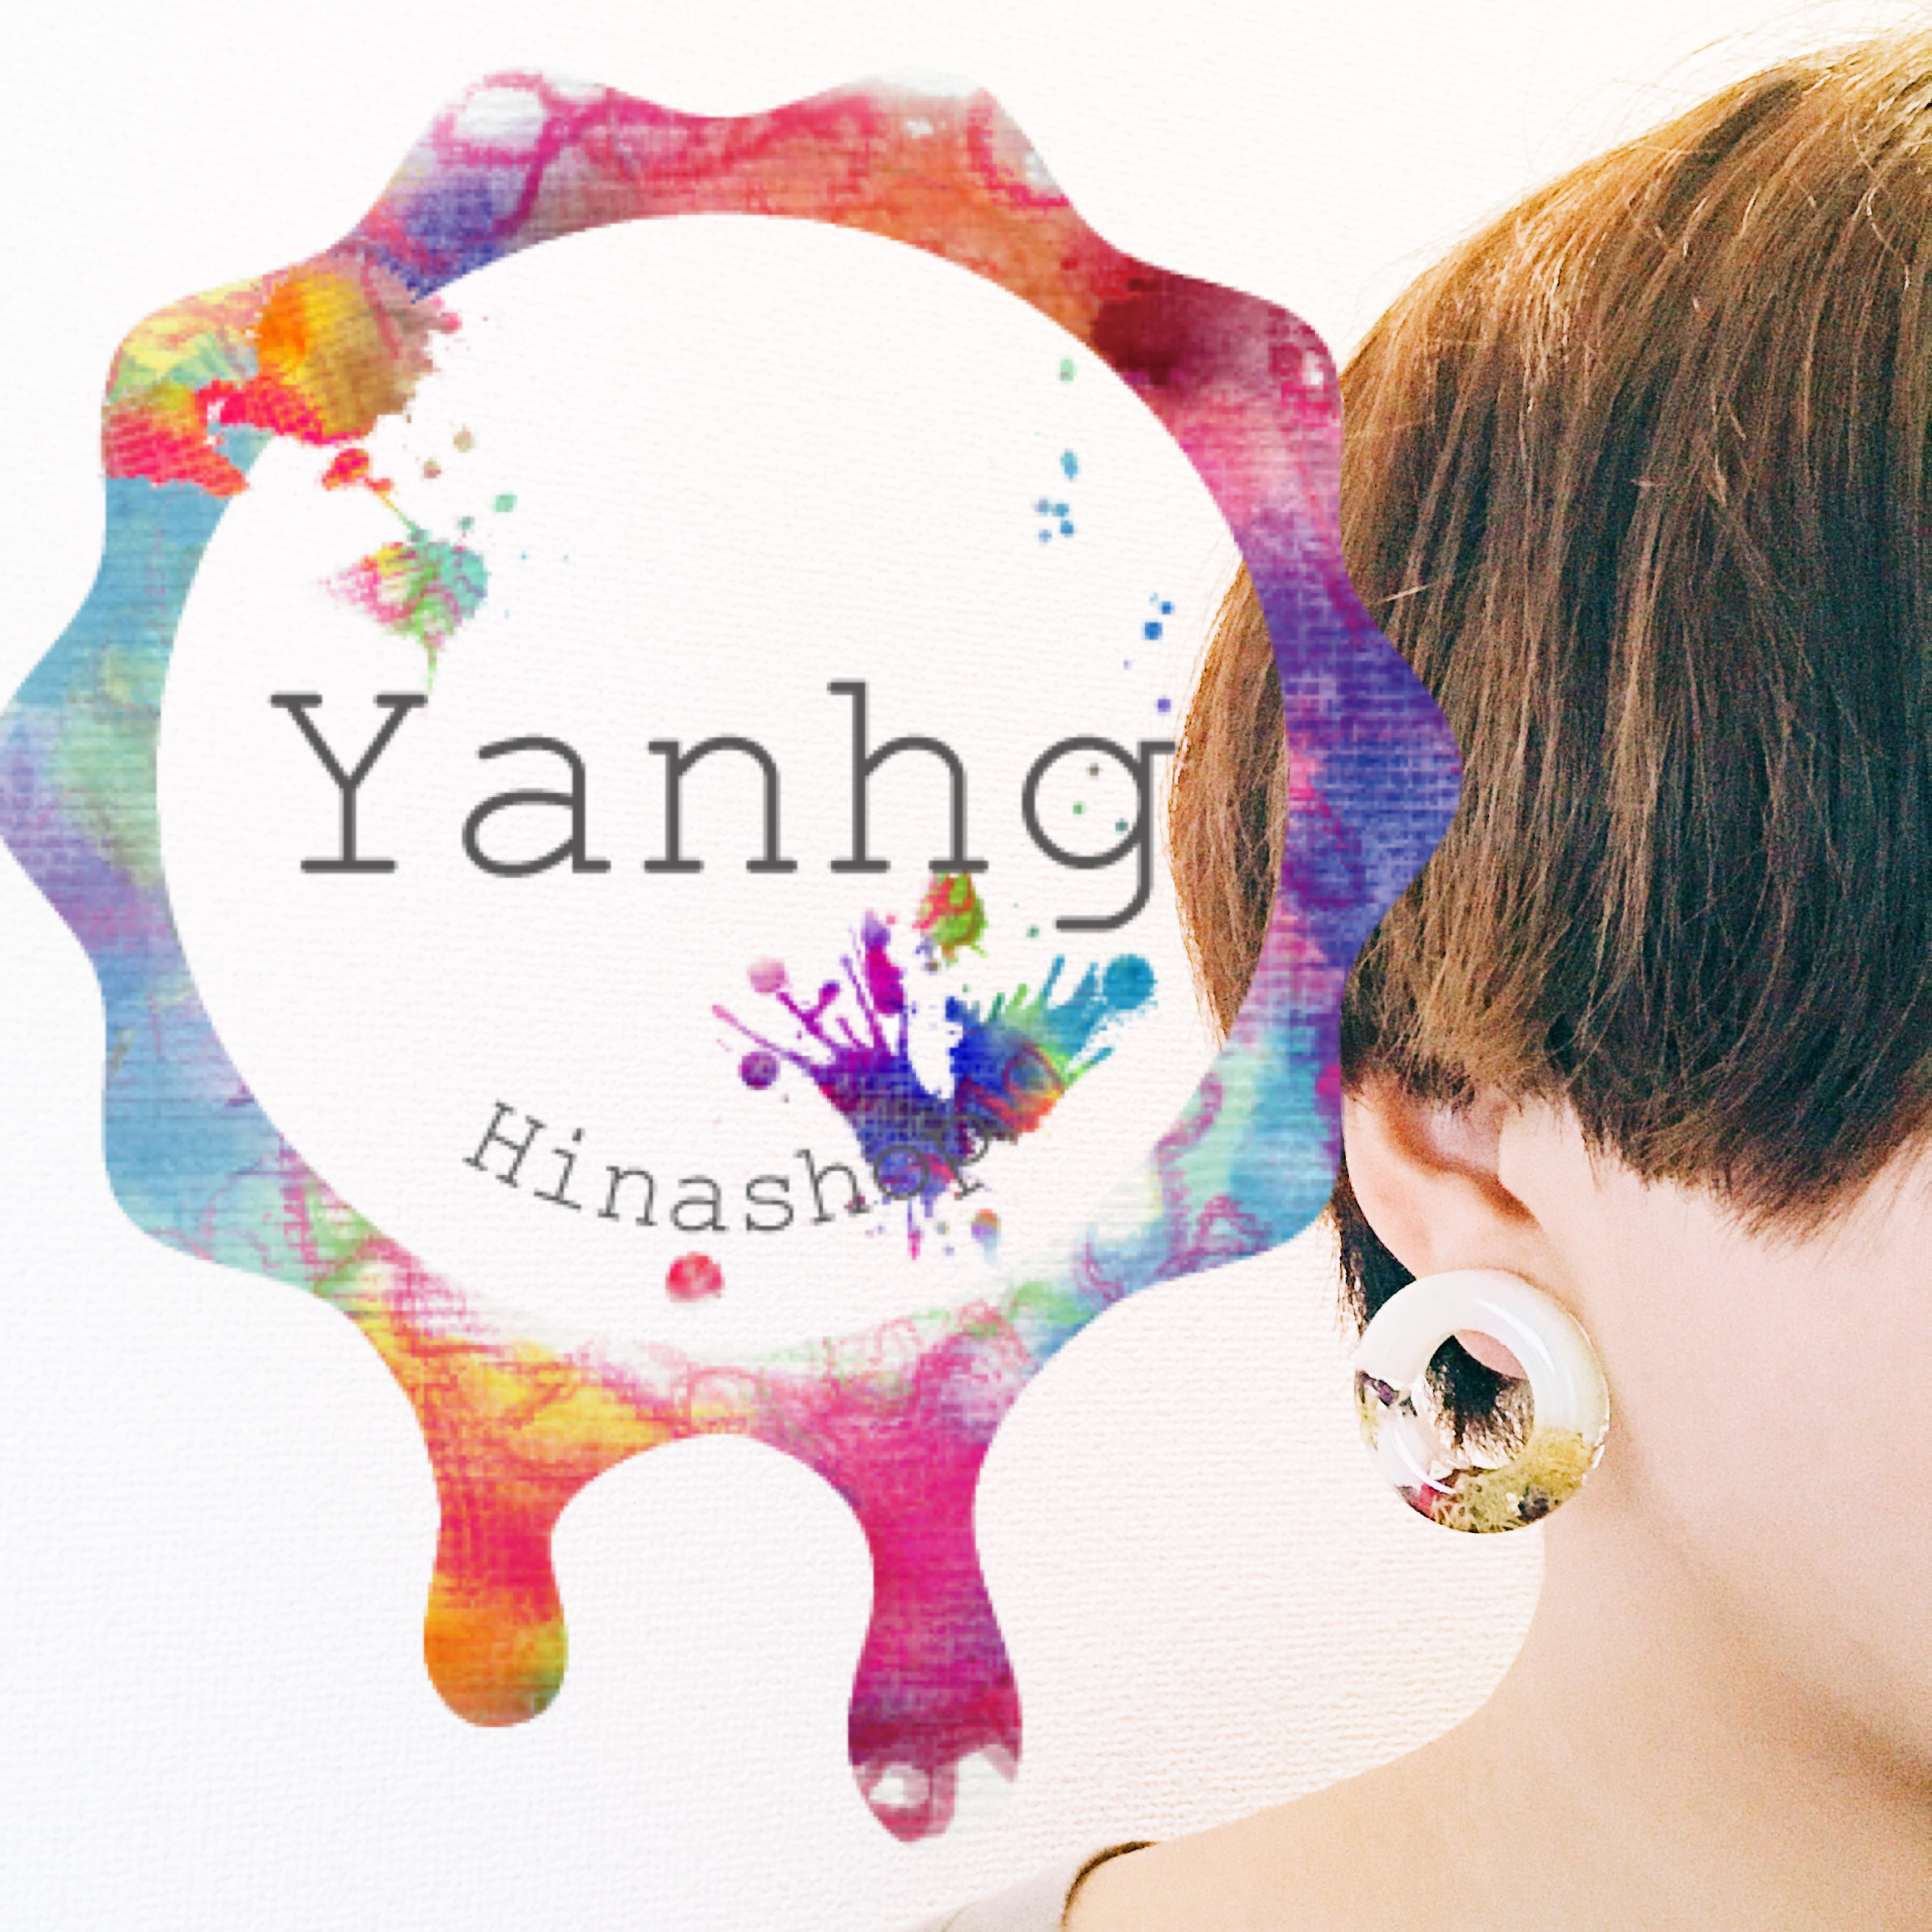 Yanhg